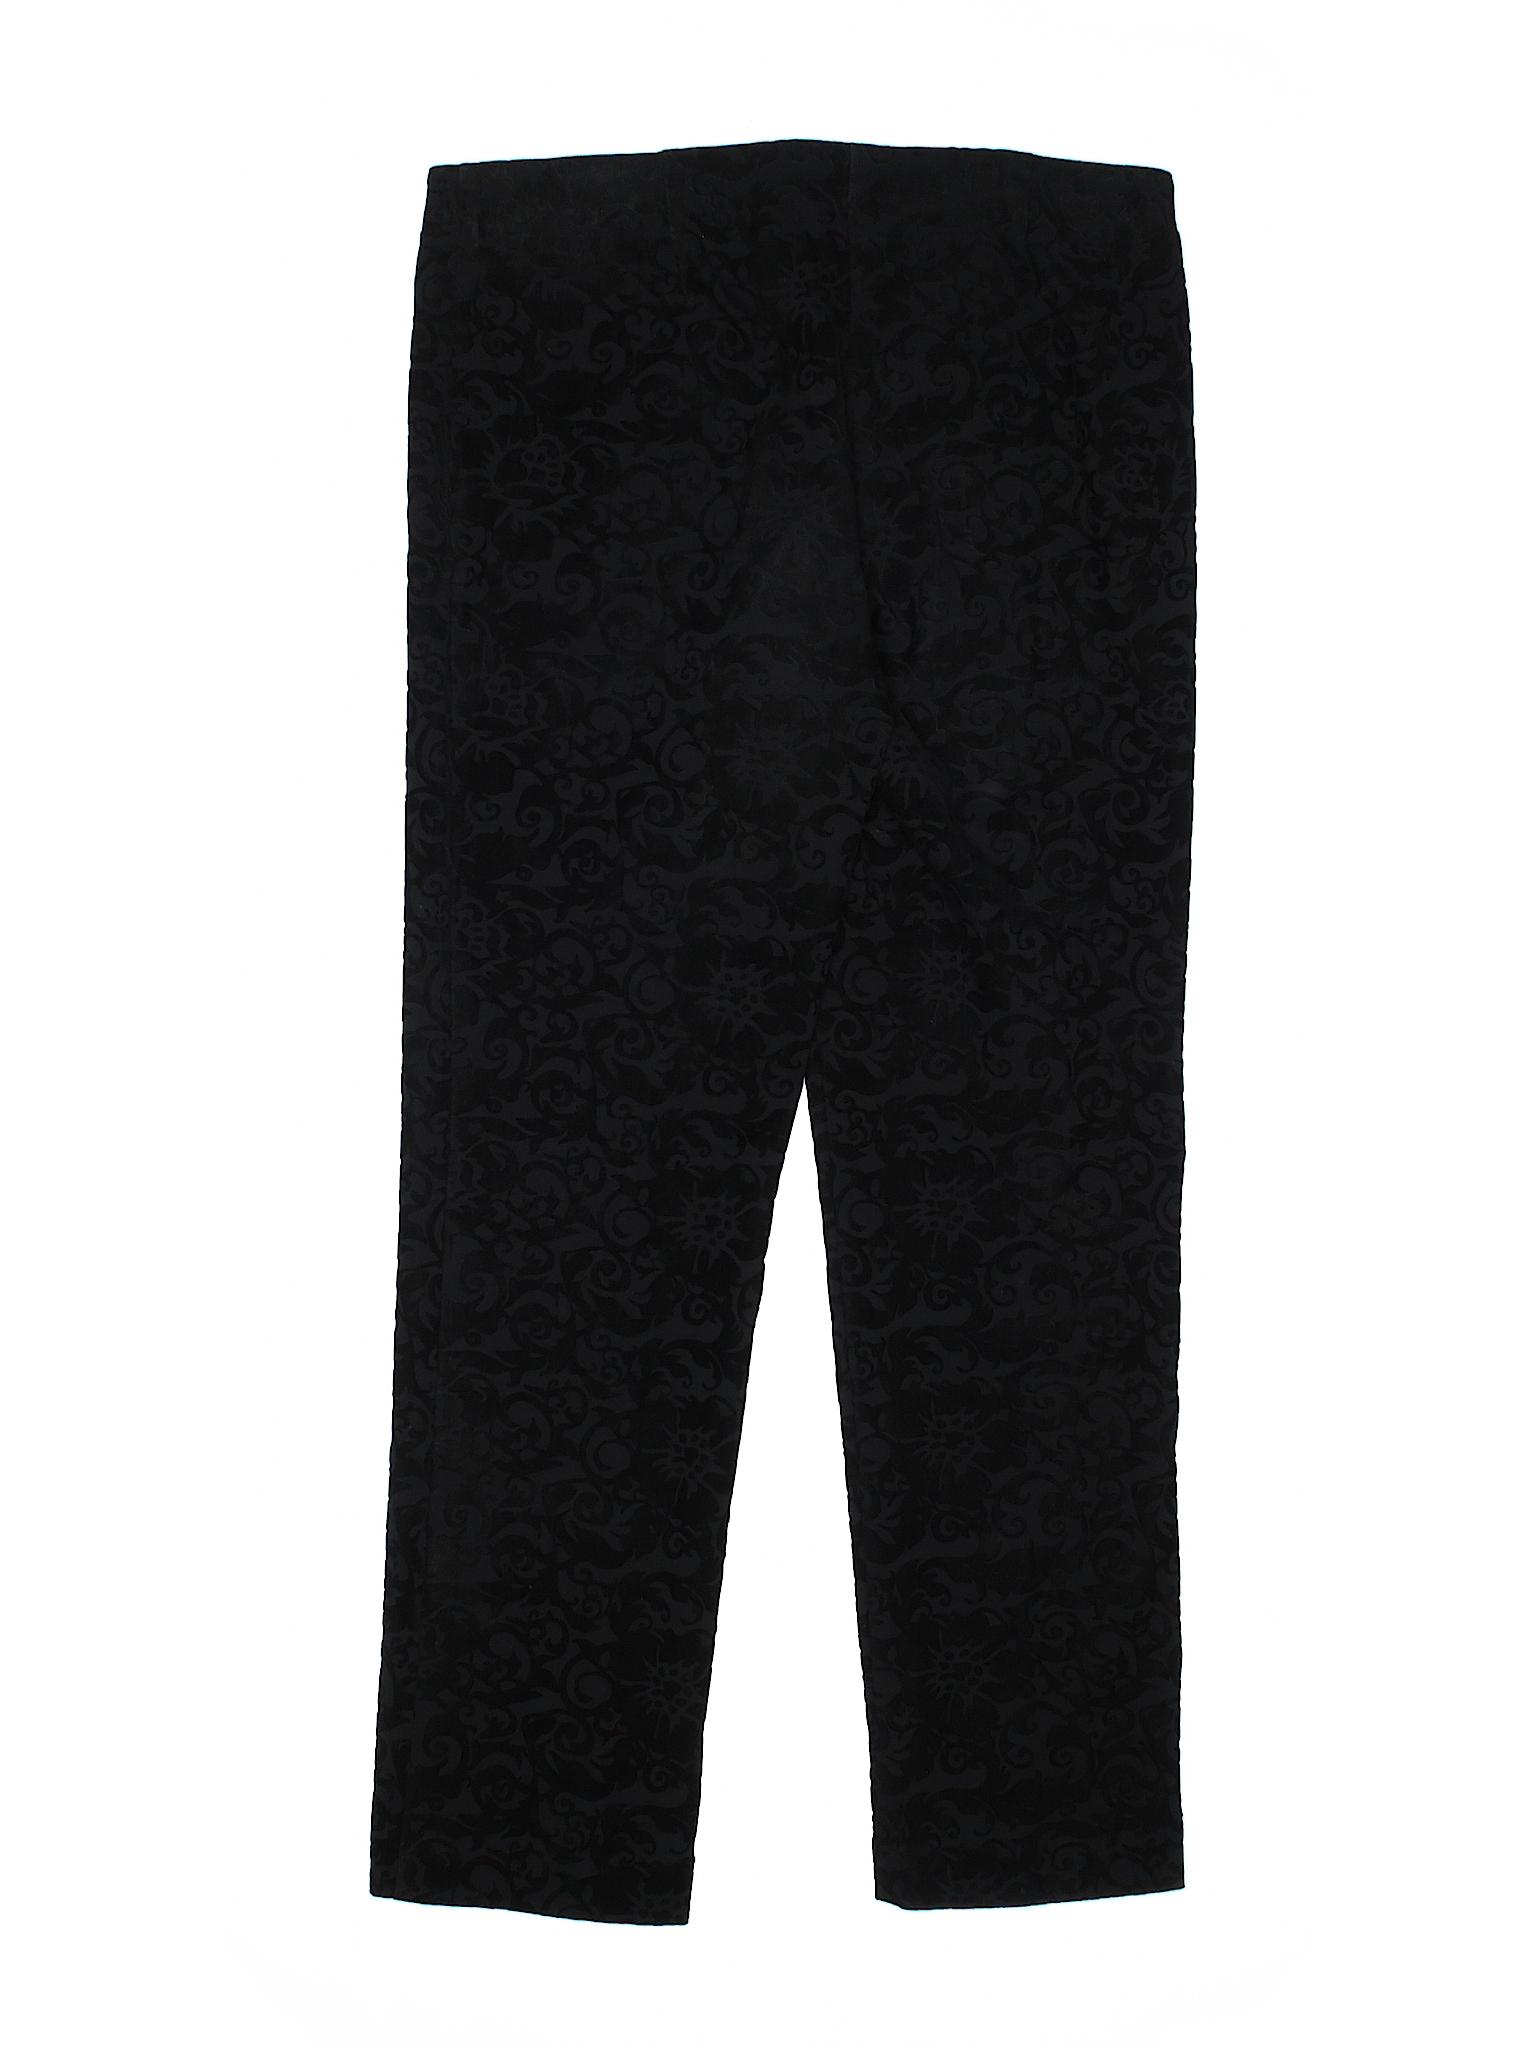 da4fd759267 Attyre New York Solid Black Velour Pants Size 4 - 88% off